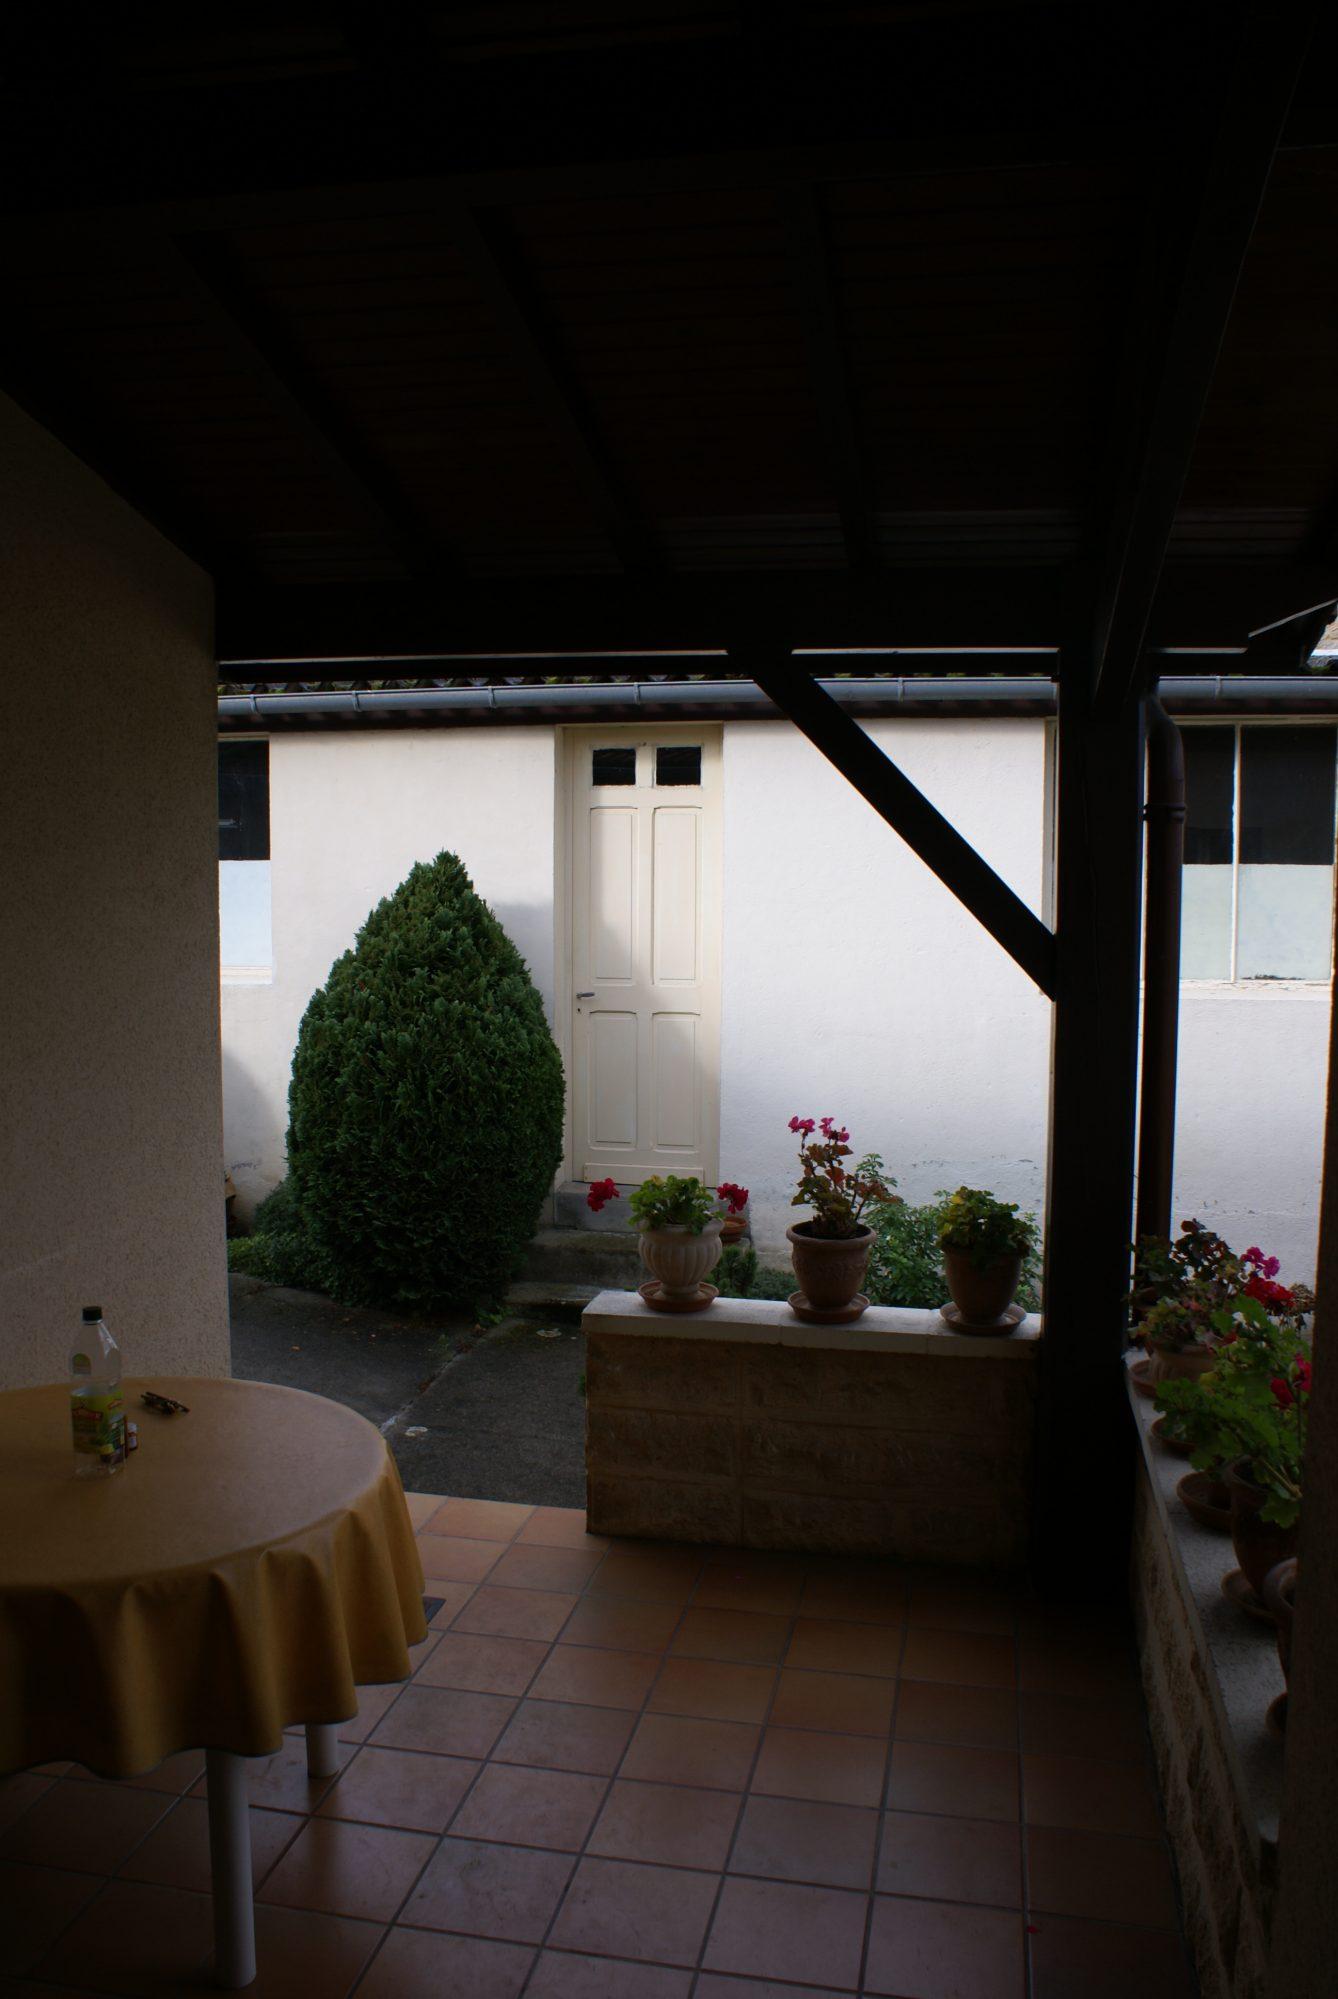 Limoges au calme limoges immobilier associ s marque for Ma maison limoges